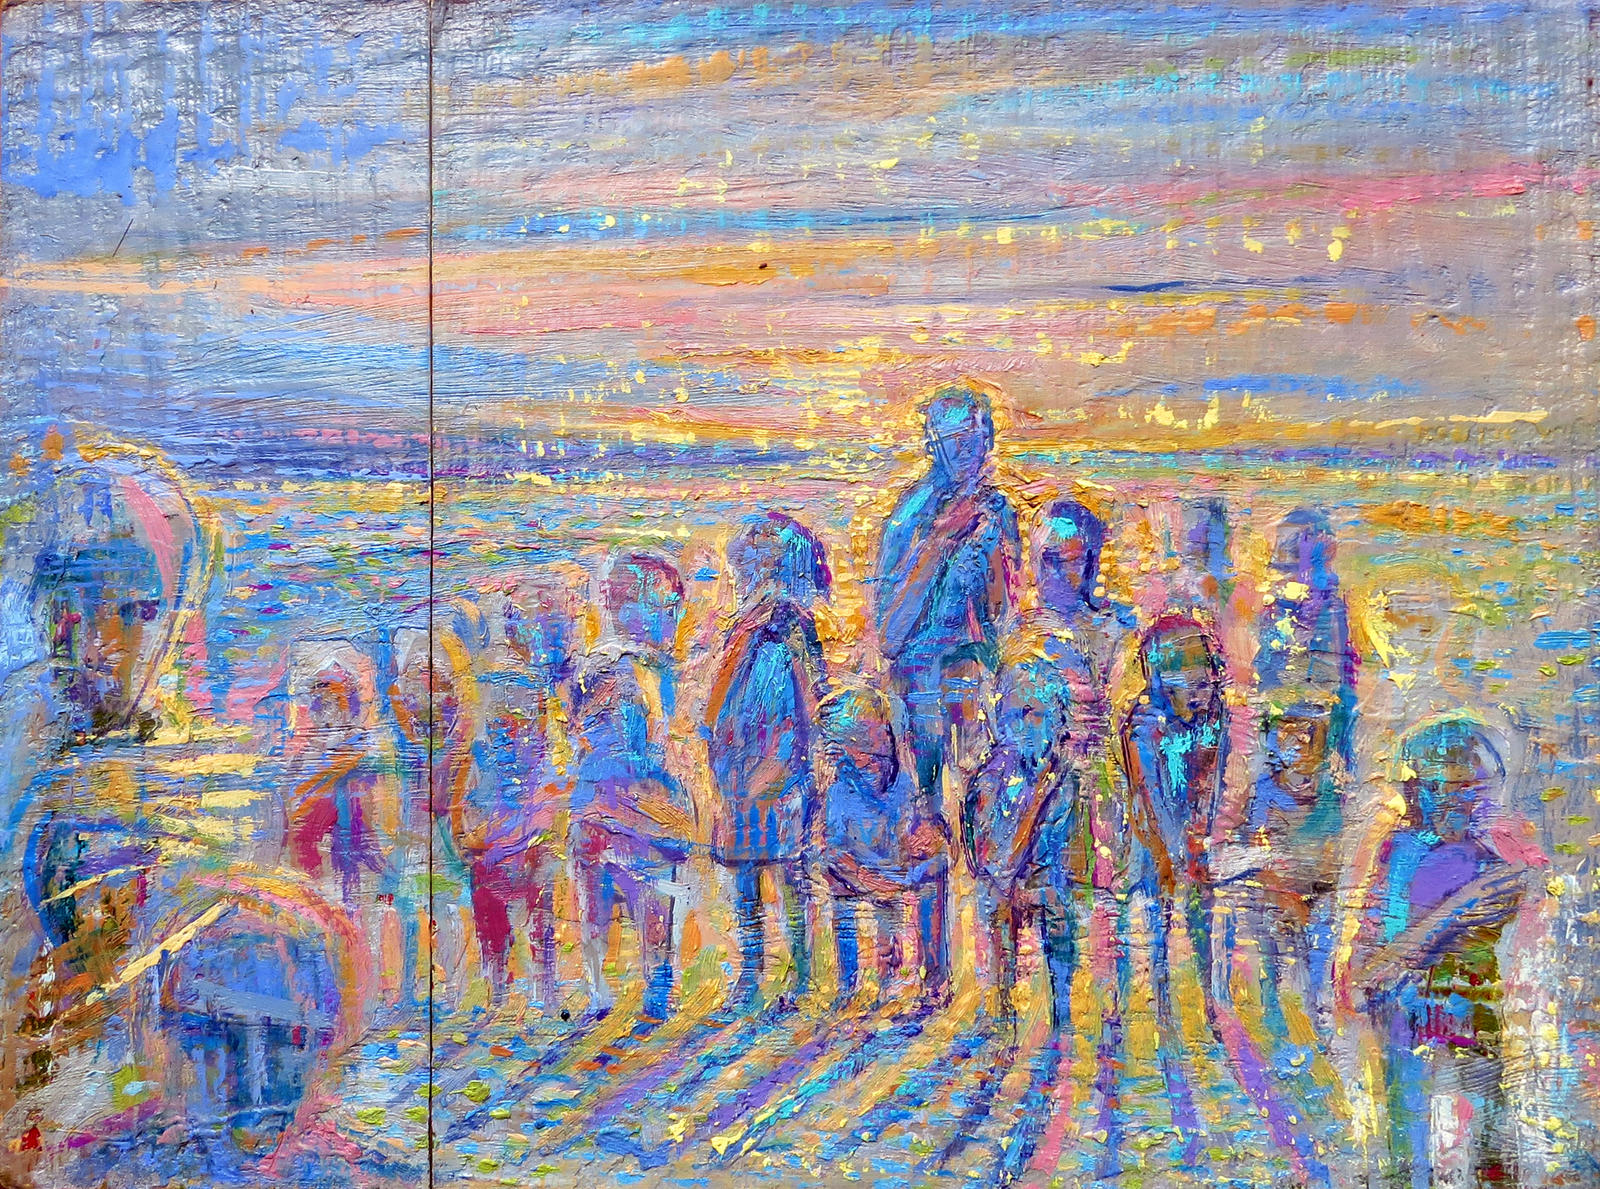 Atmosfera dorada - 1998 by andresbestardmaggio